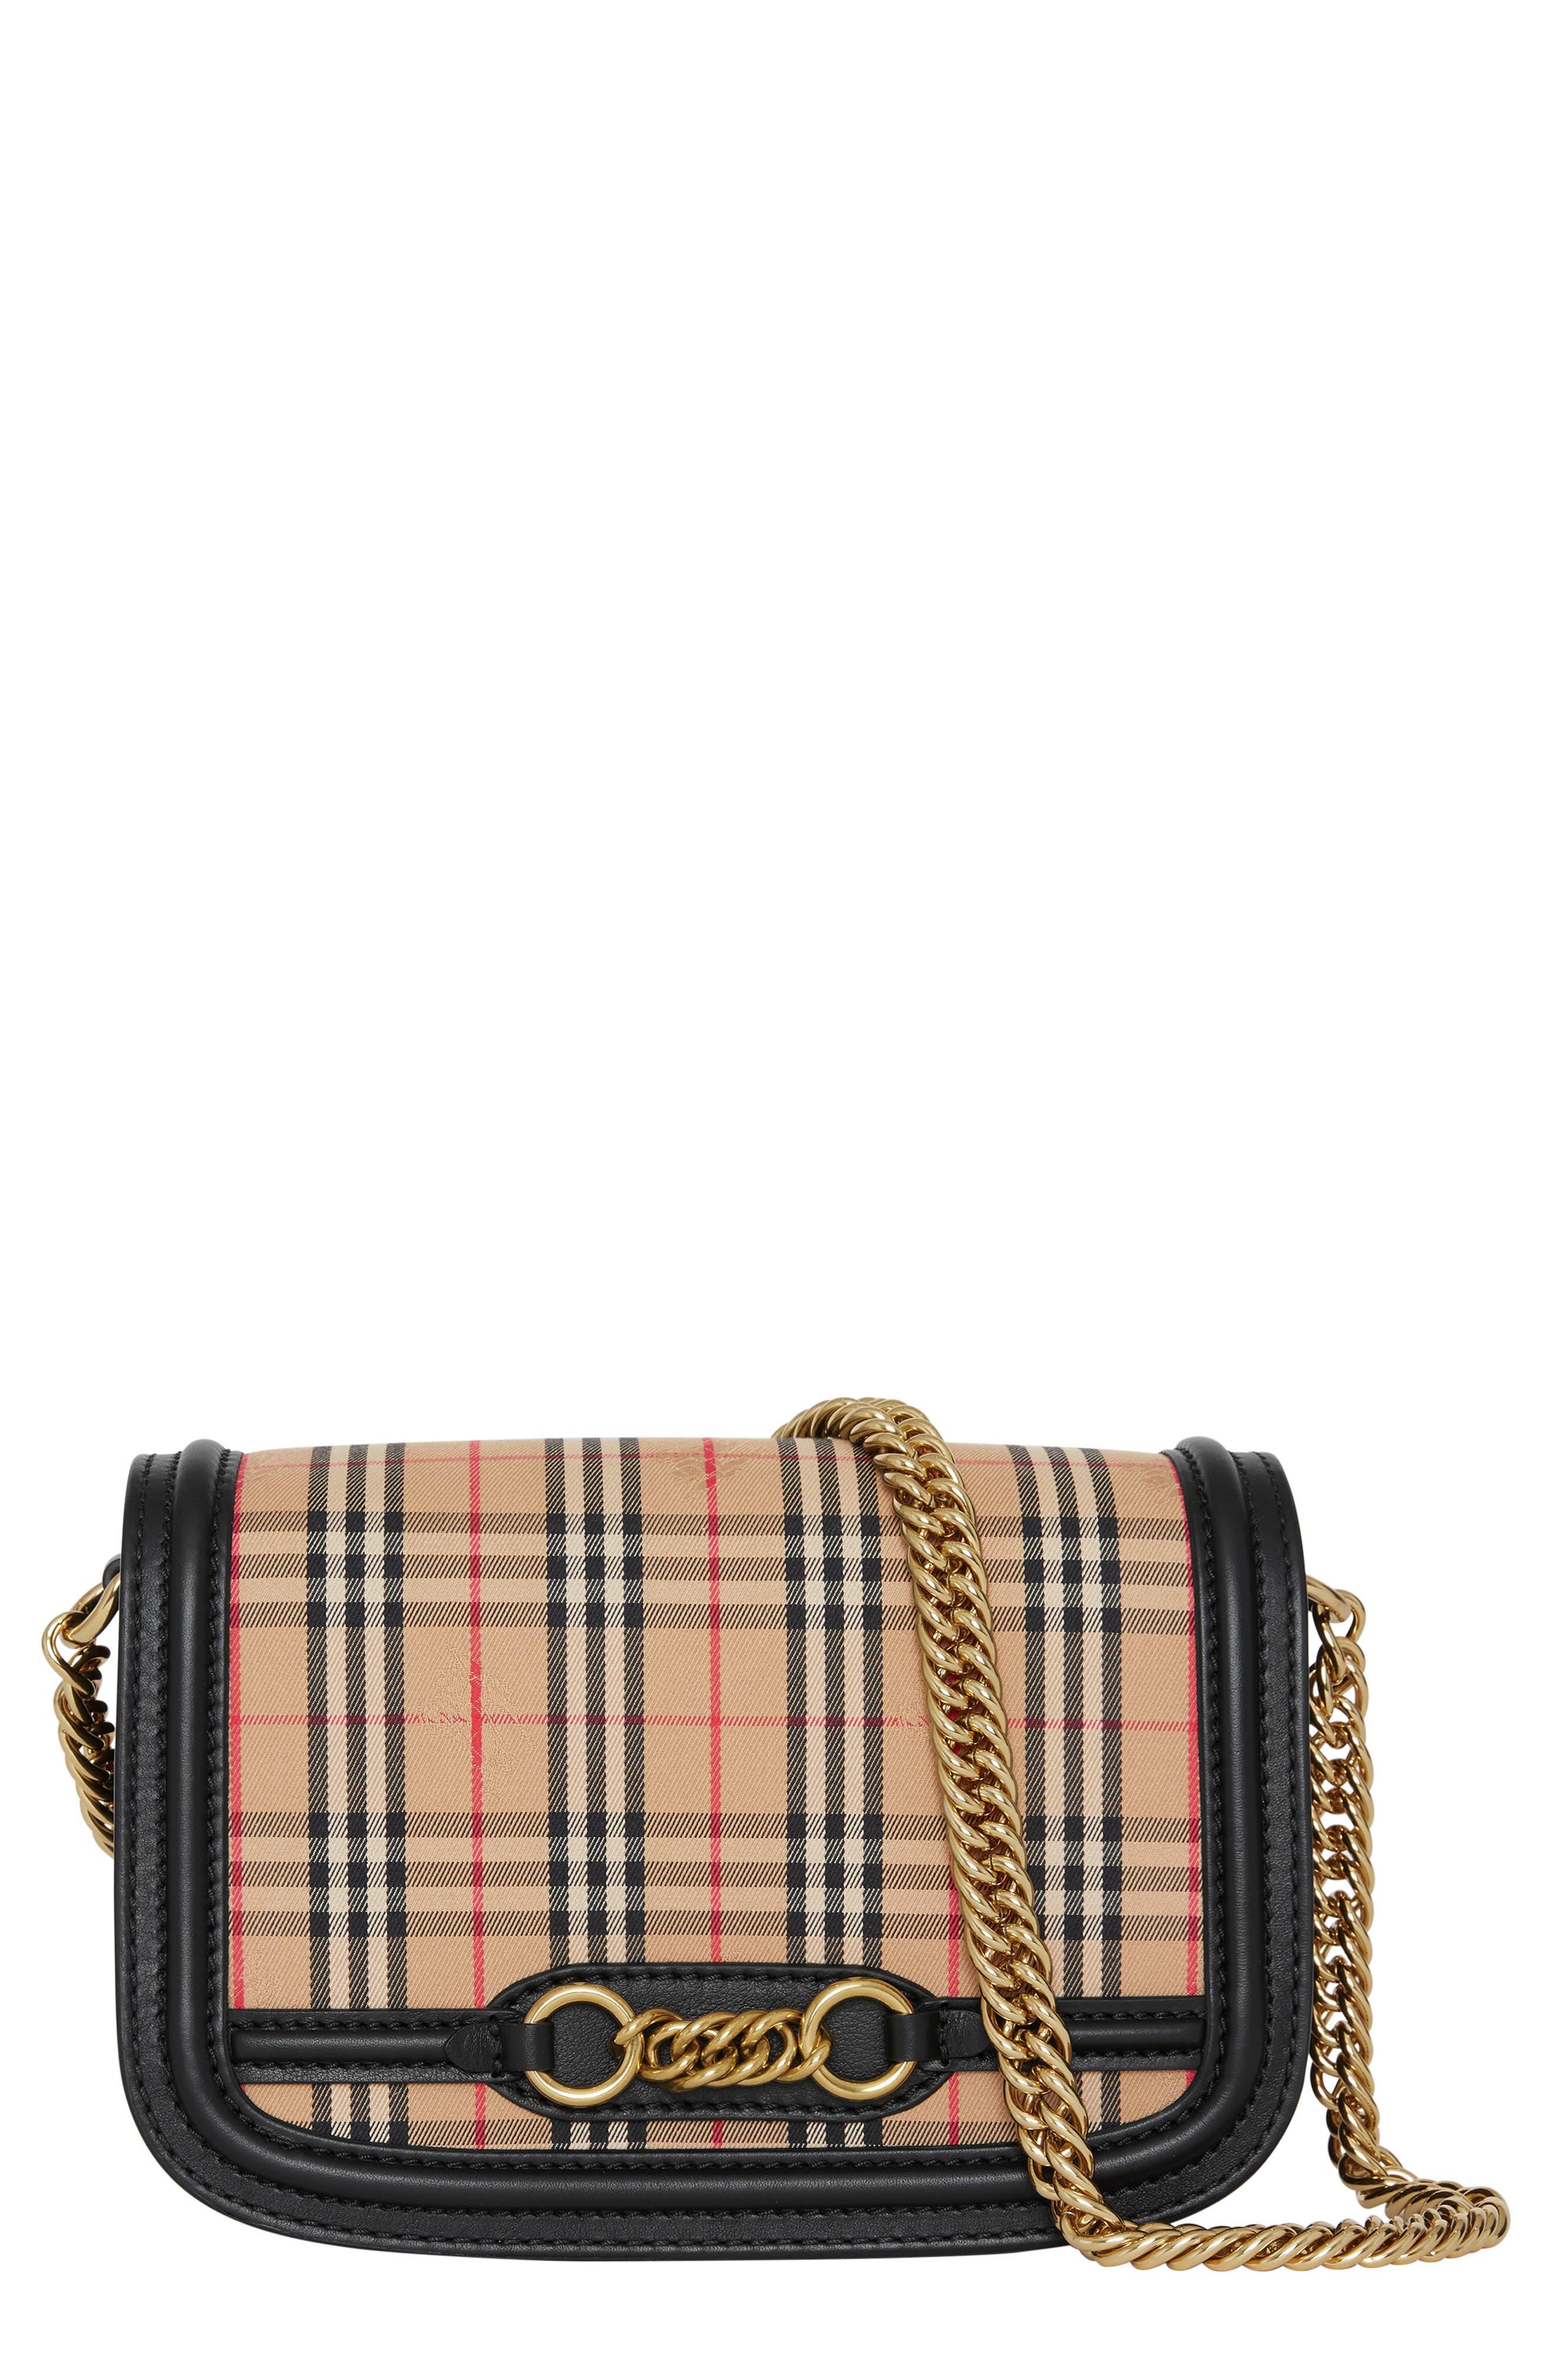 Vintage Check Link Flap Crossbody Bag, Main, color, BLACK